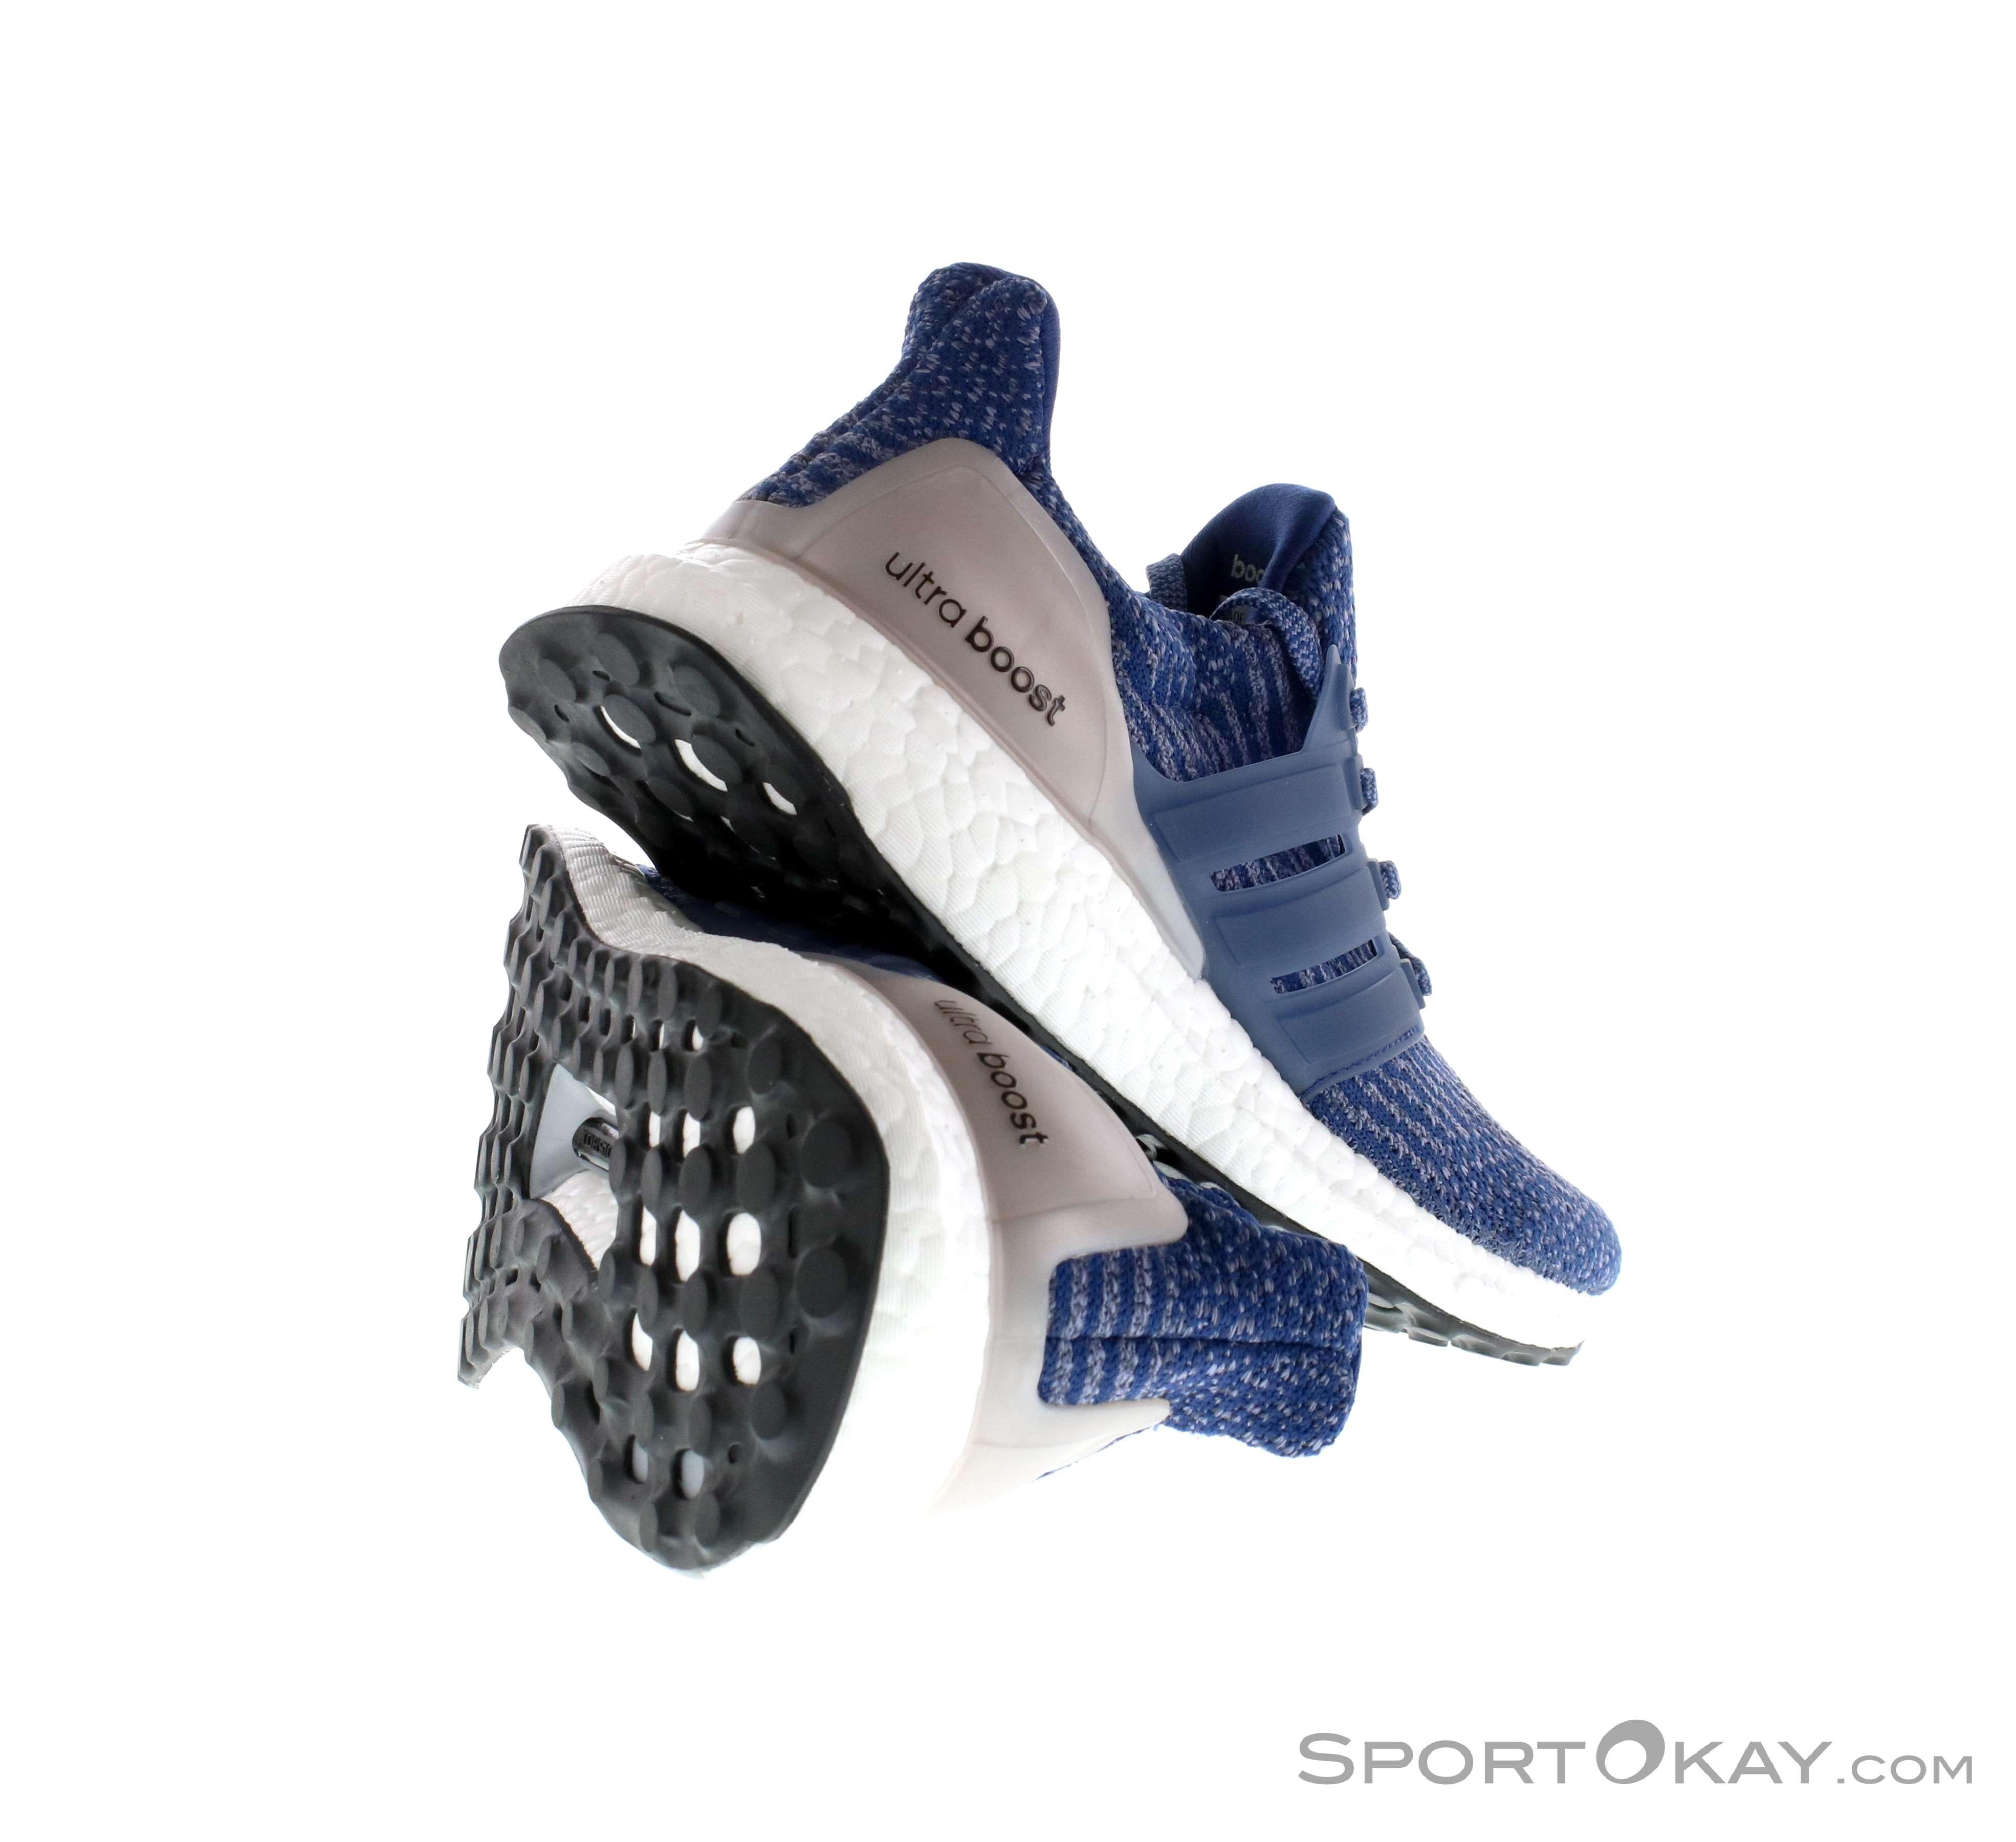 Corsa Adidas Ultra Scarpe Donna Boost Ginnastica Da XX7wxa8qn